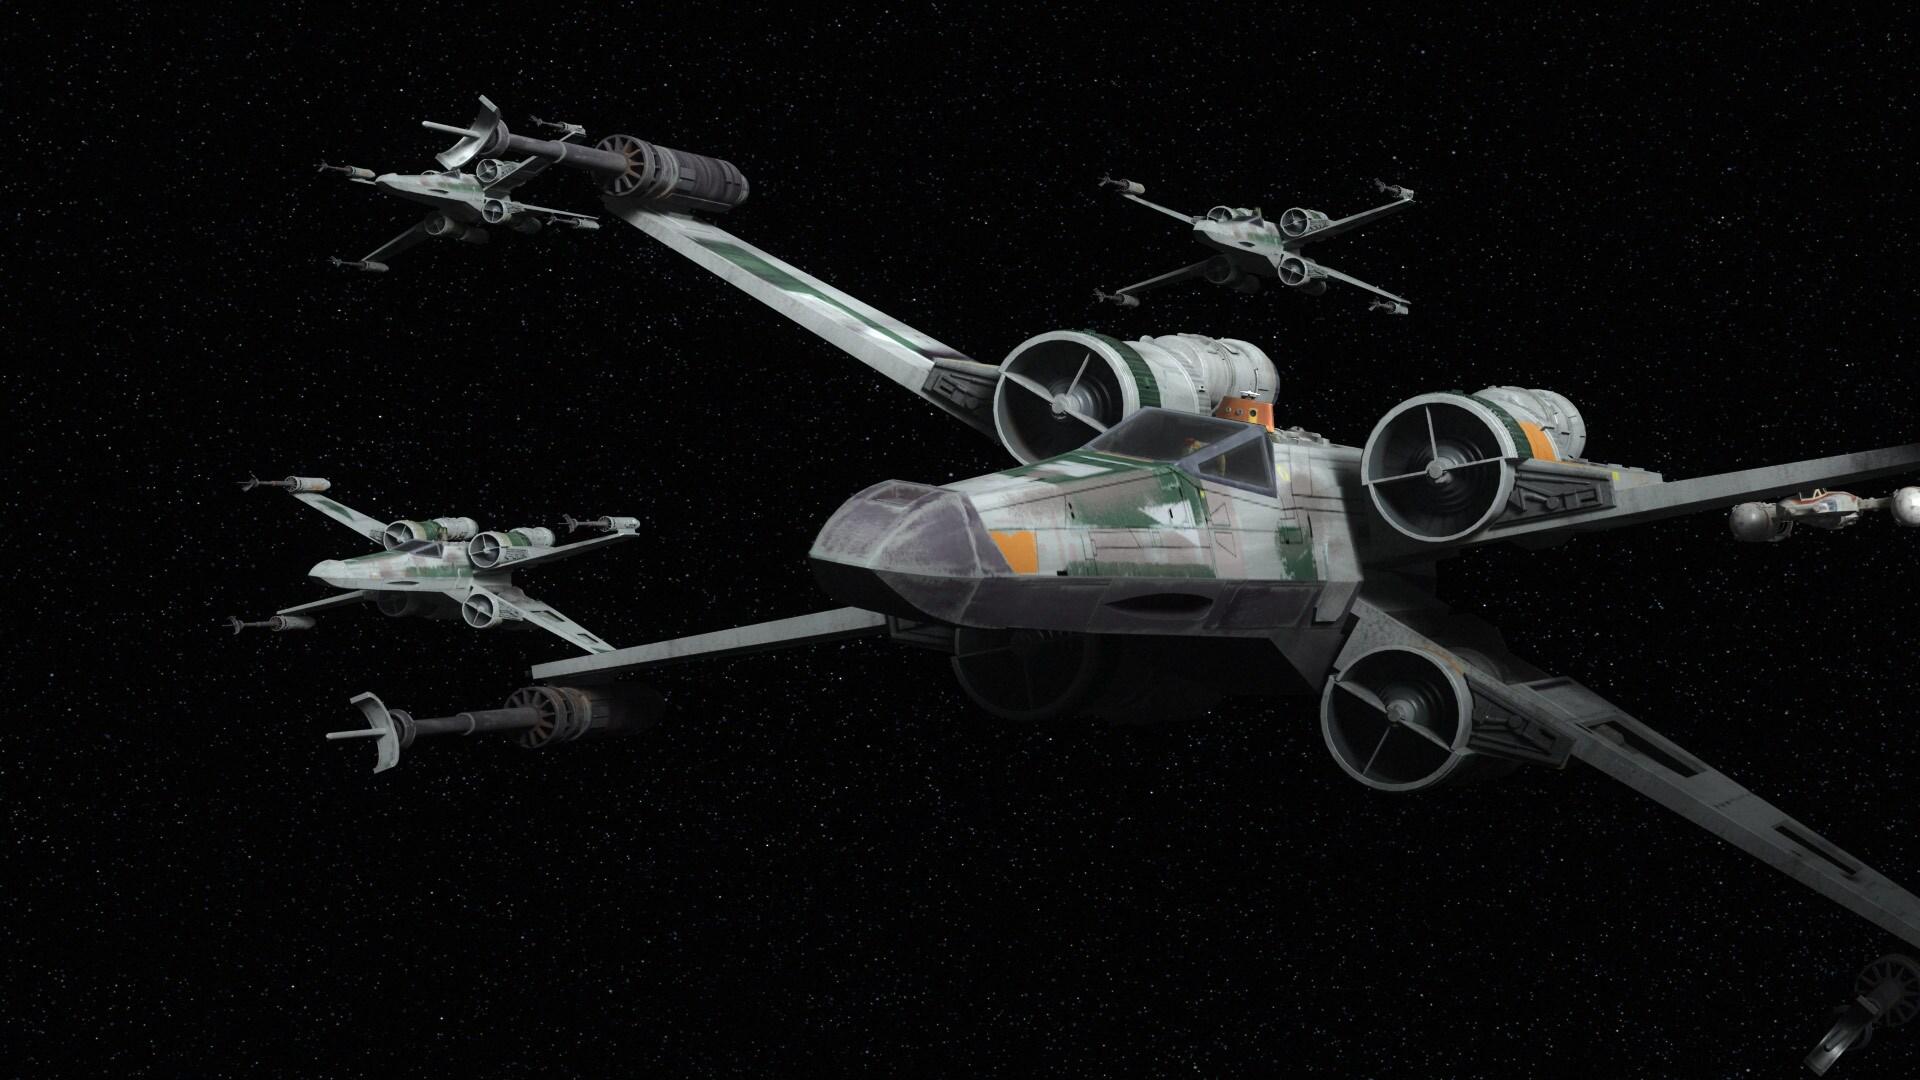 rebel assault star wars rebels 01 2ba0e66f